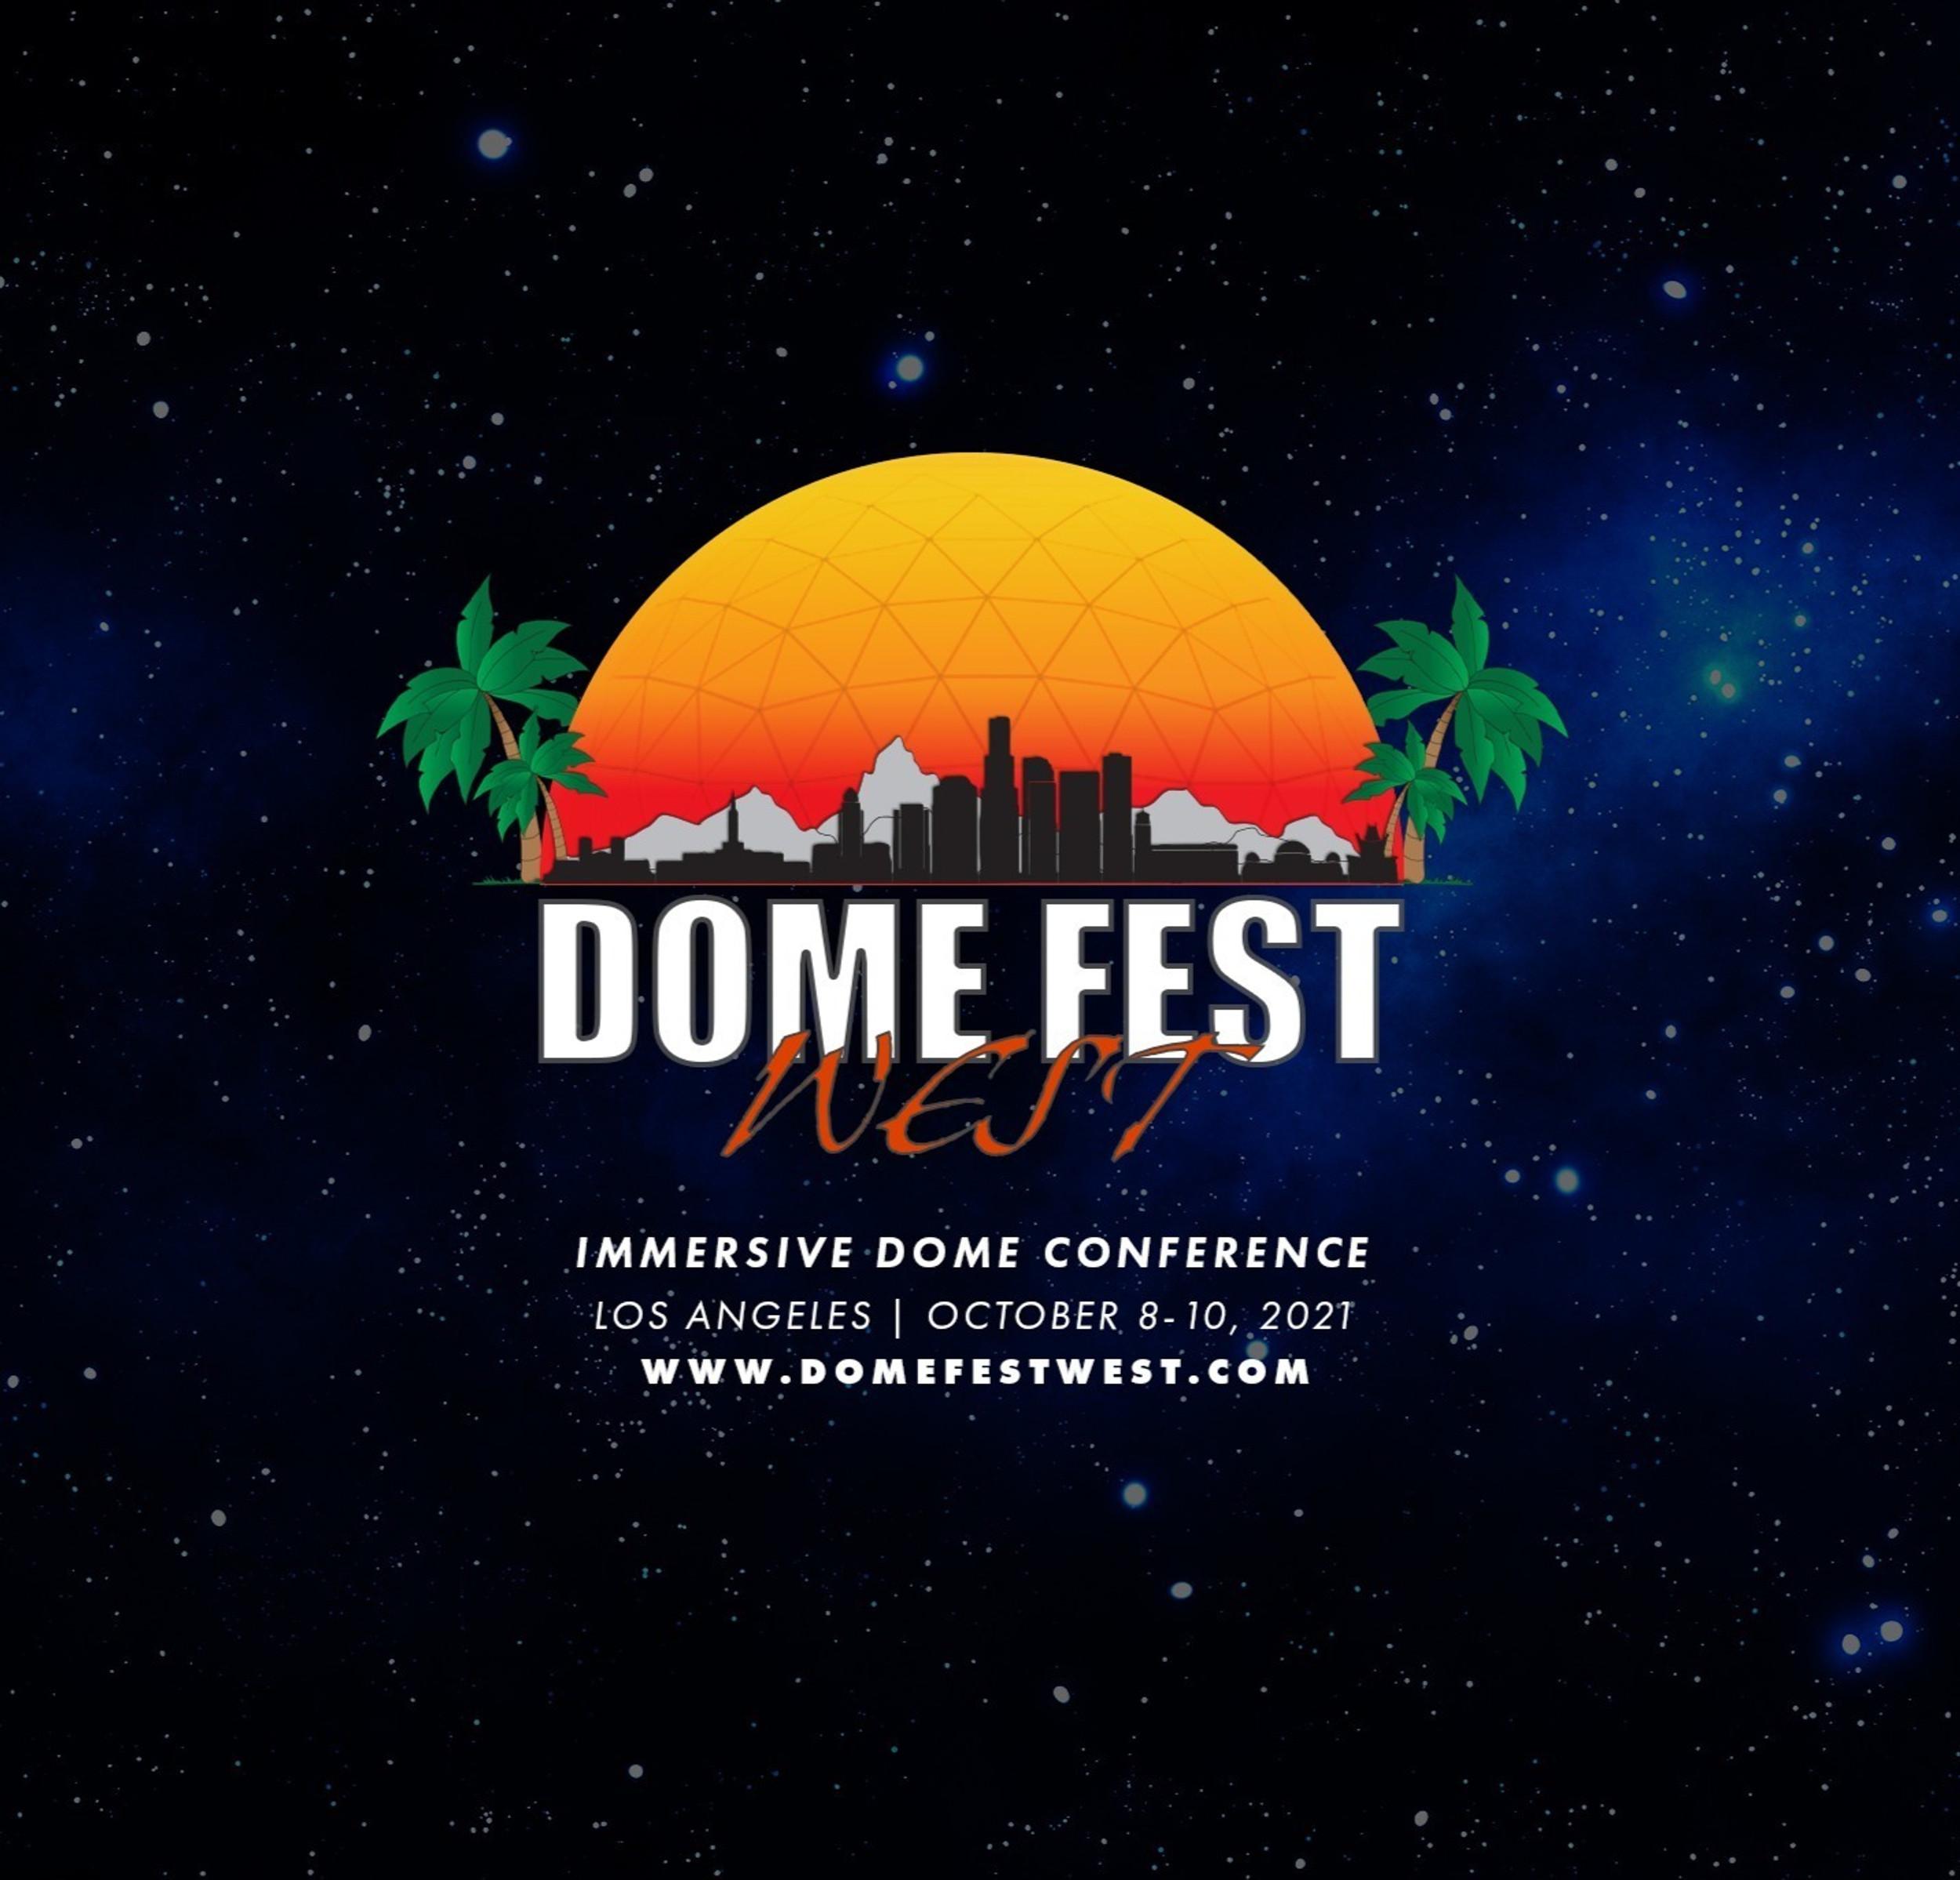 2021 Dome Fest West | Immersive Dome Film Festival - Dome Fest West